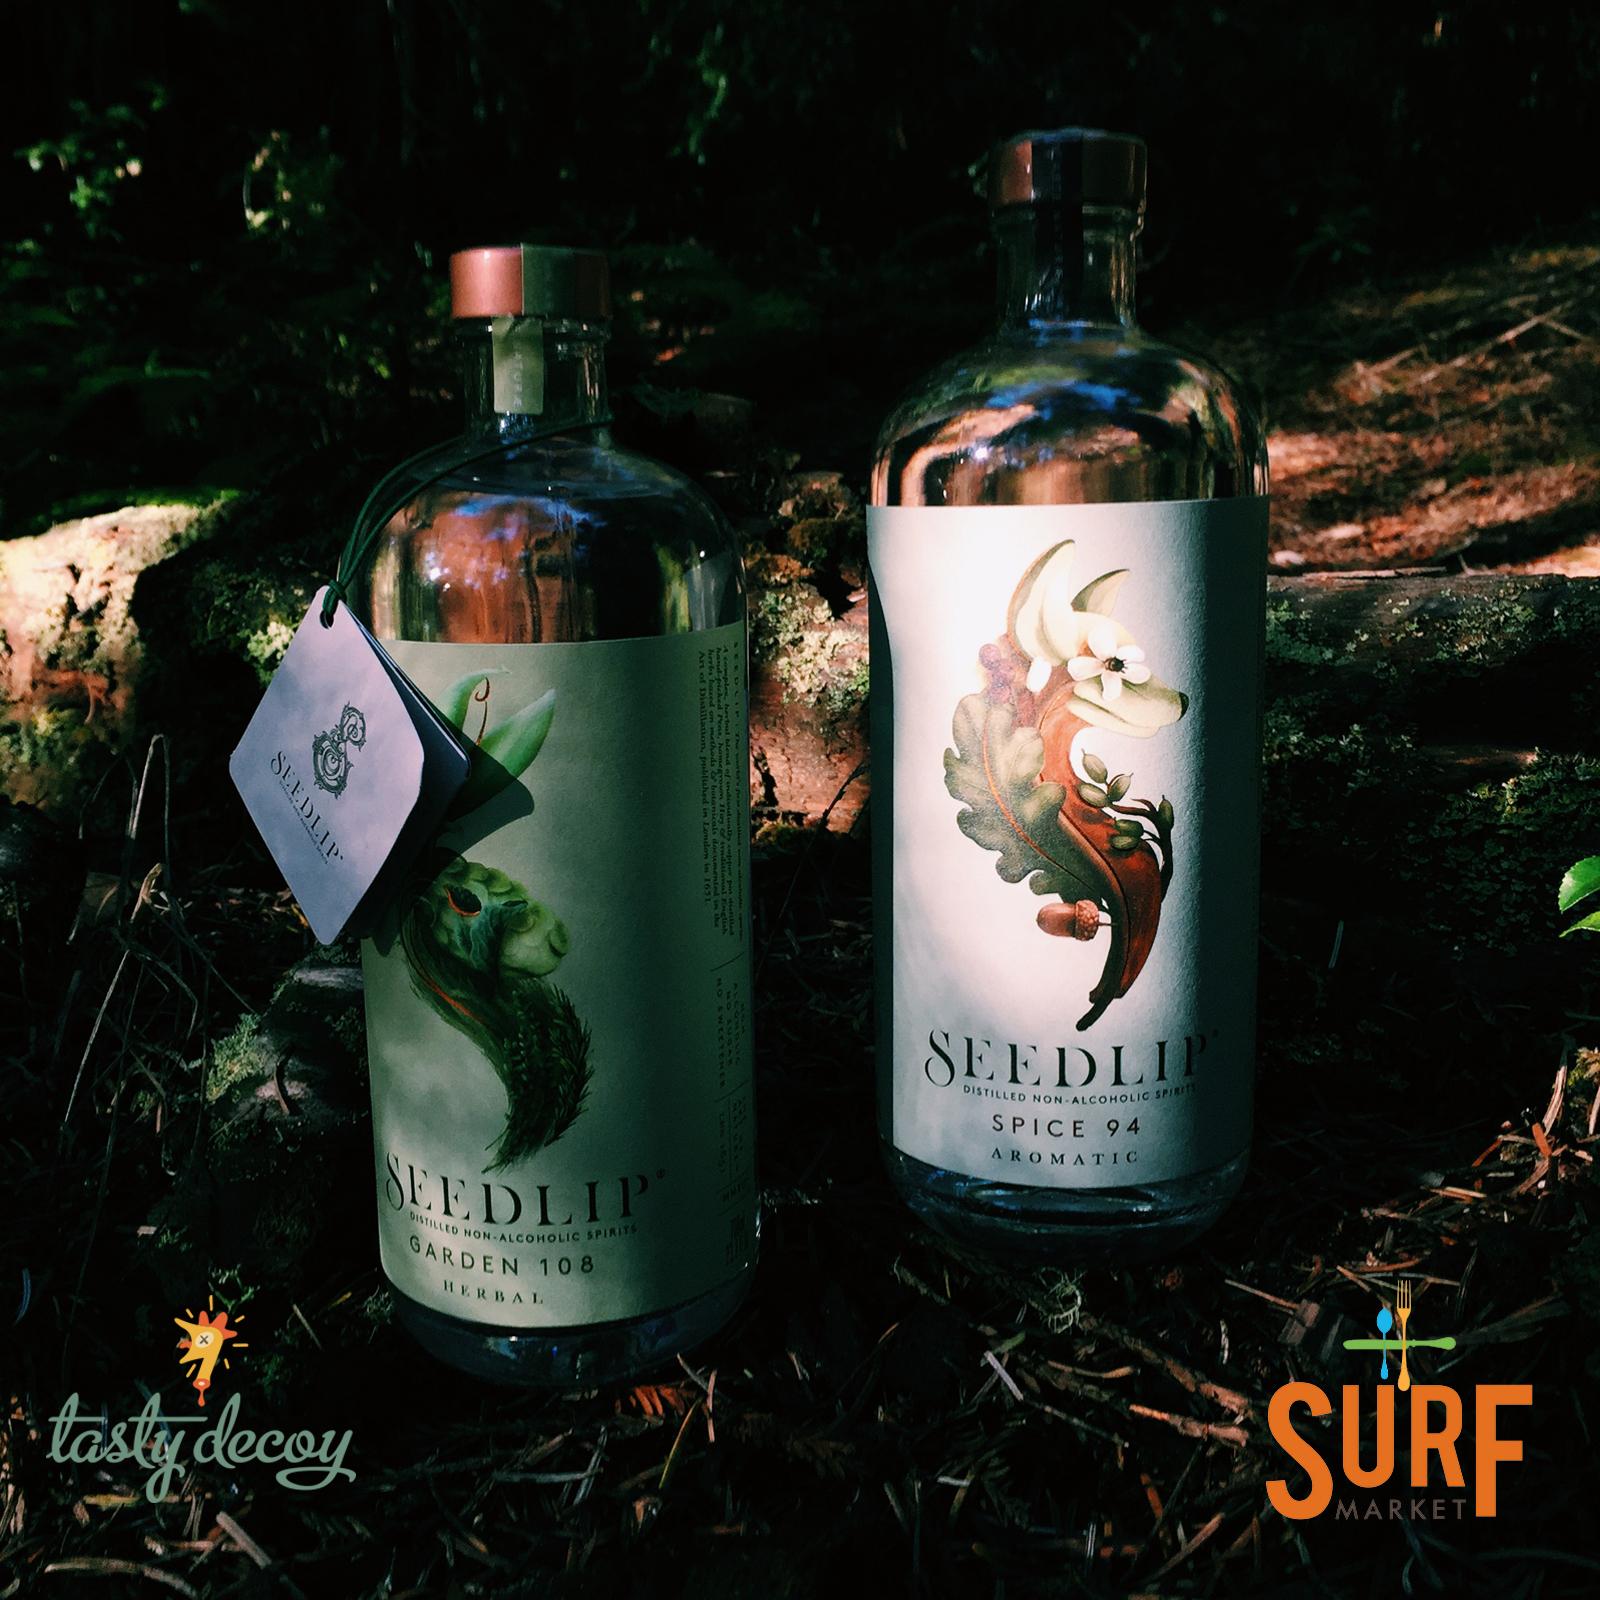 Seedlip's Distilled Non-Alcoholic Spirits